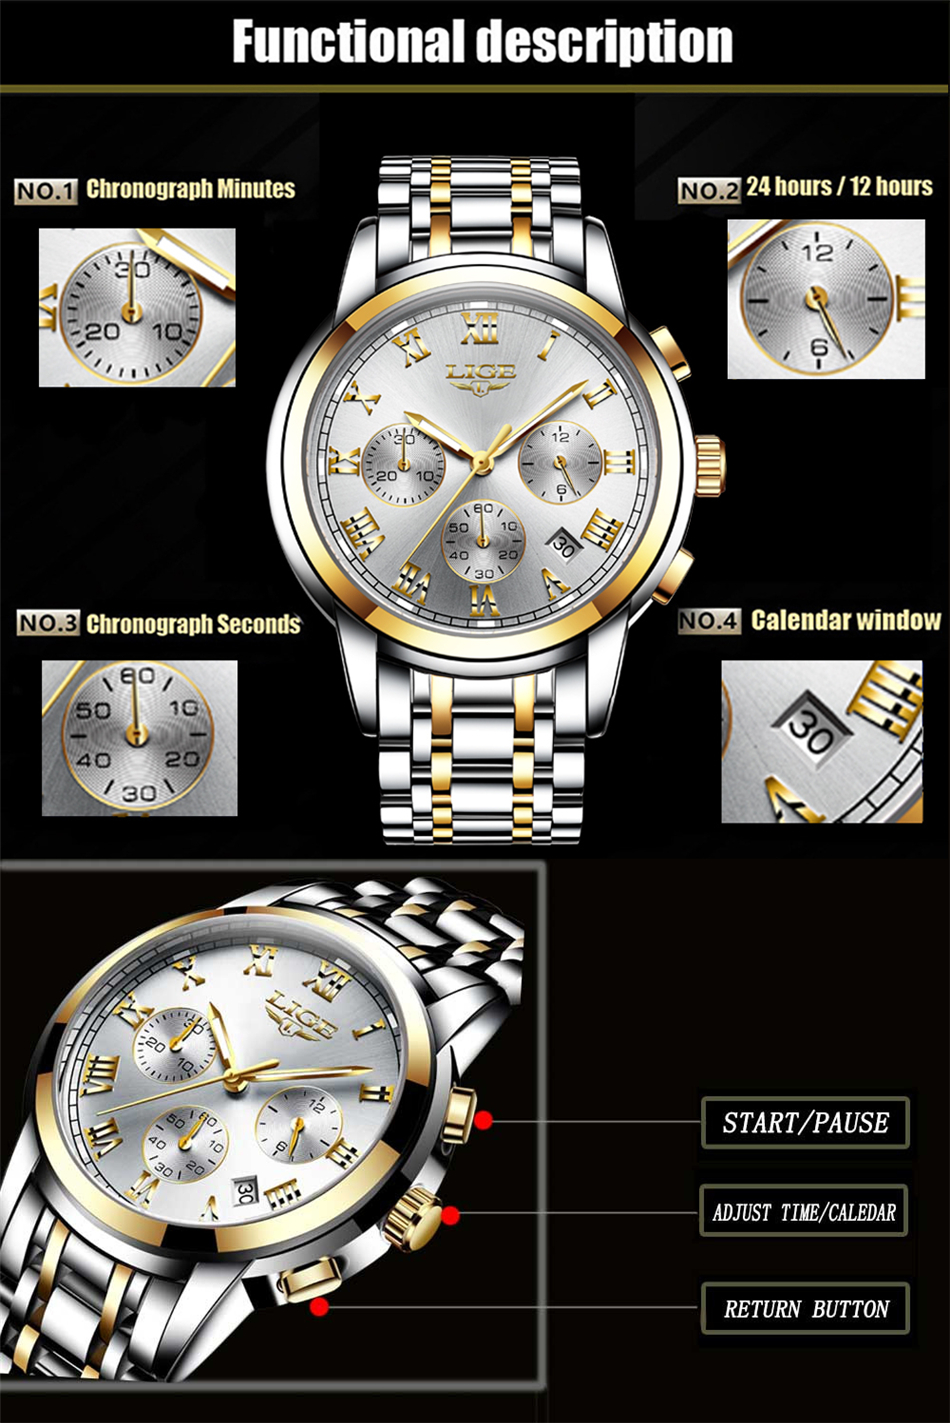 HTB146mce.uF3KVjSZK9q6zVtXXa5 LIGE Men Watches Top Luxury Brand Full Steel Waterproof Sport Quartz Watch Men Fashion Date Clock Chronograph Relogio Masculino